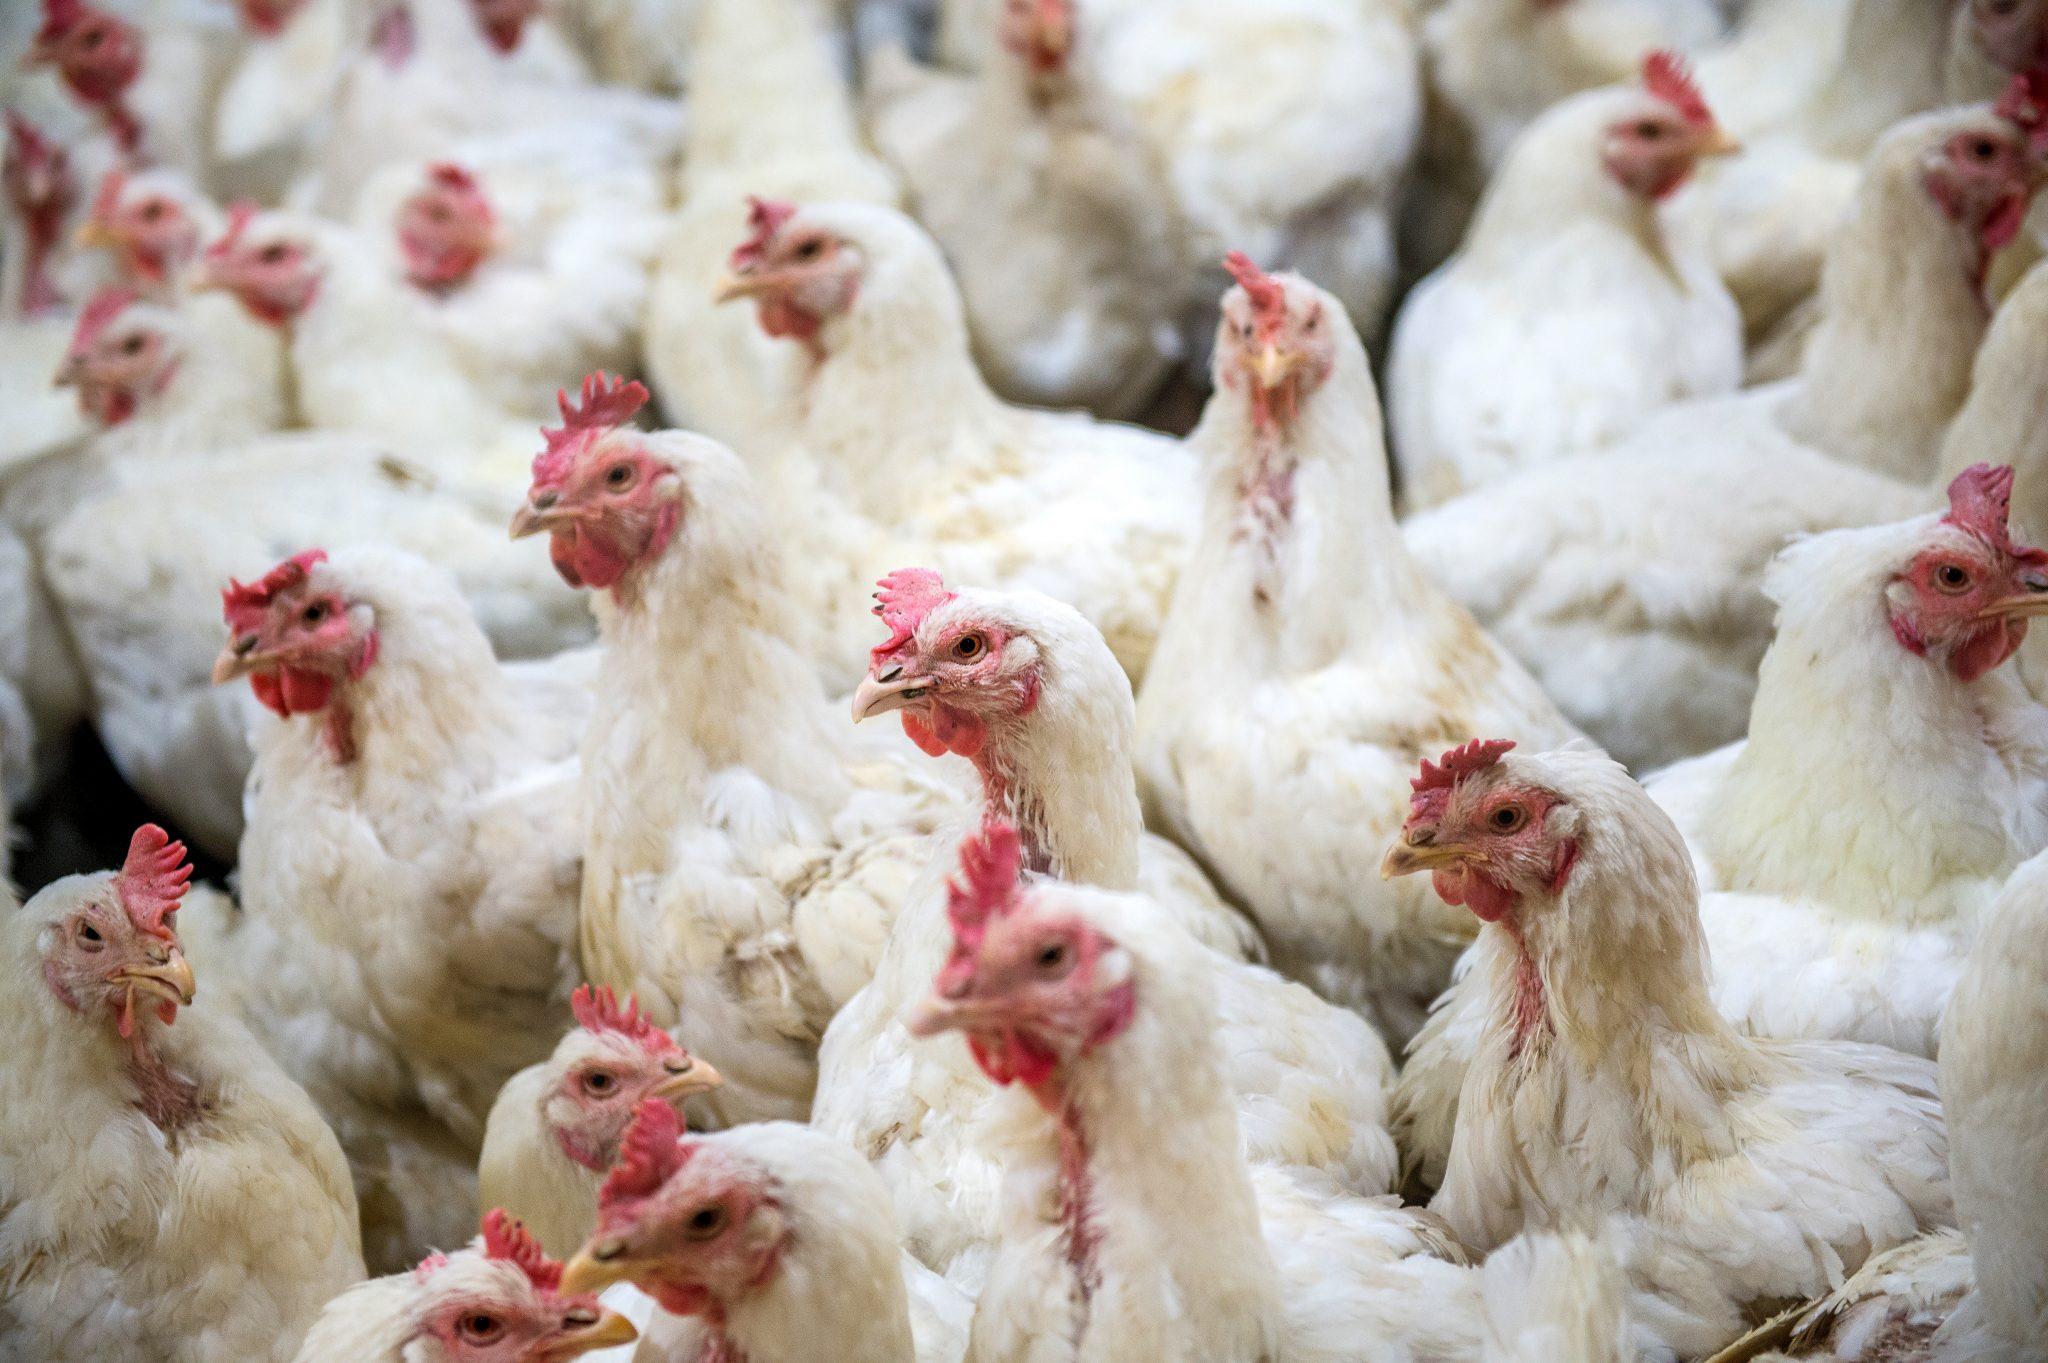 White chickens on farm